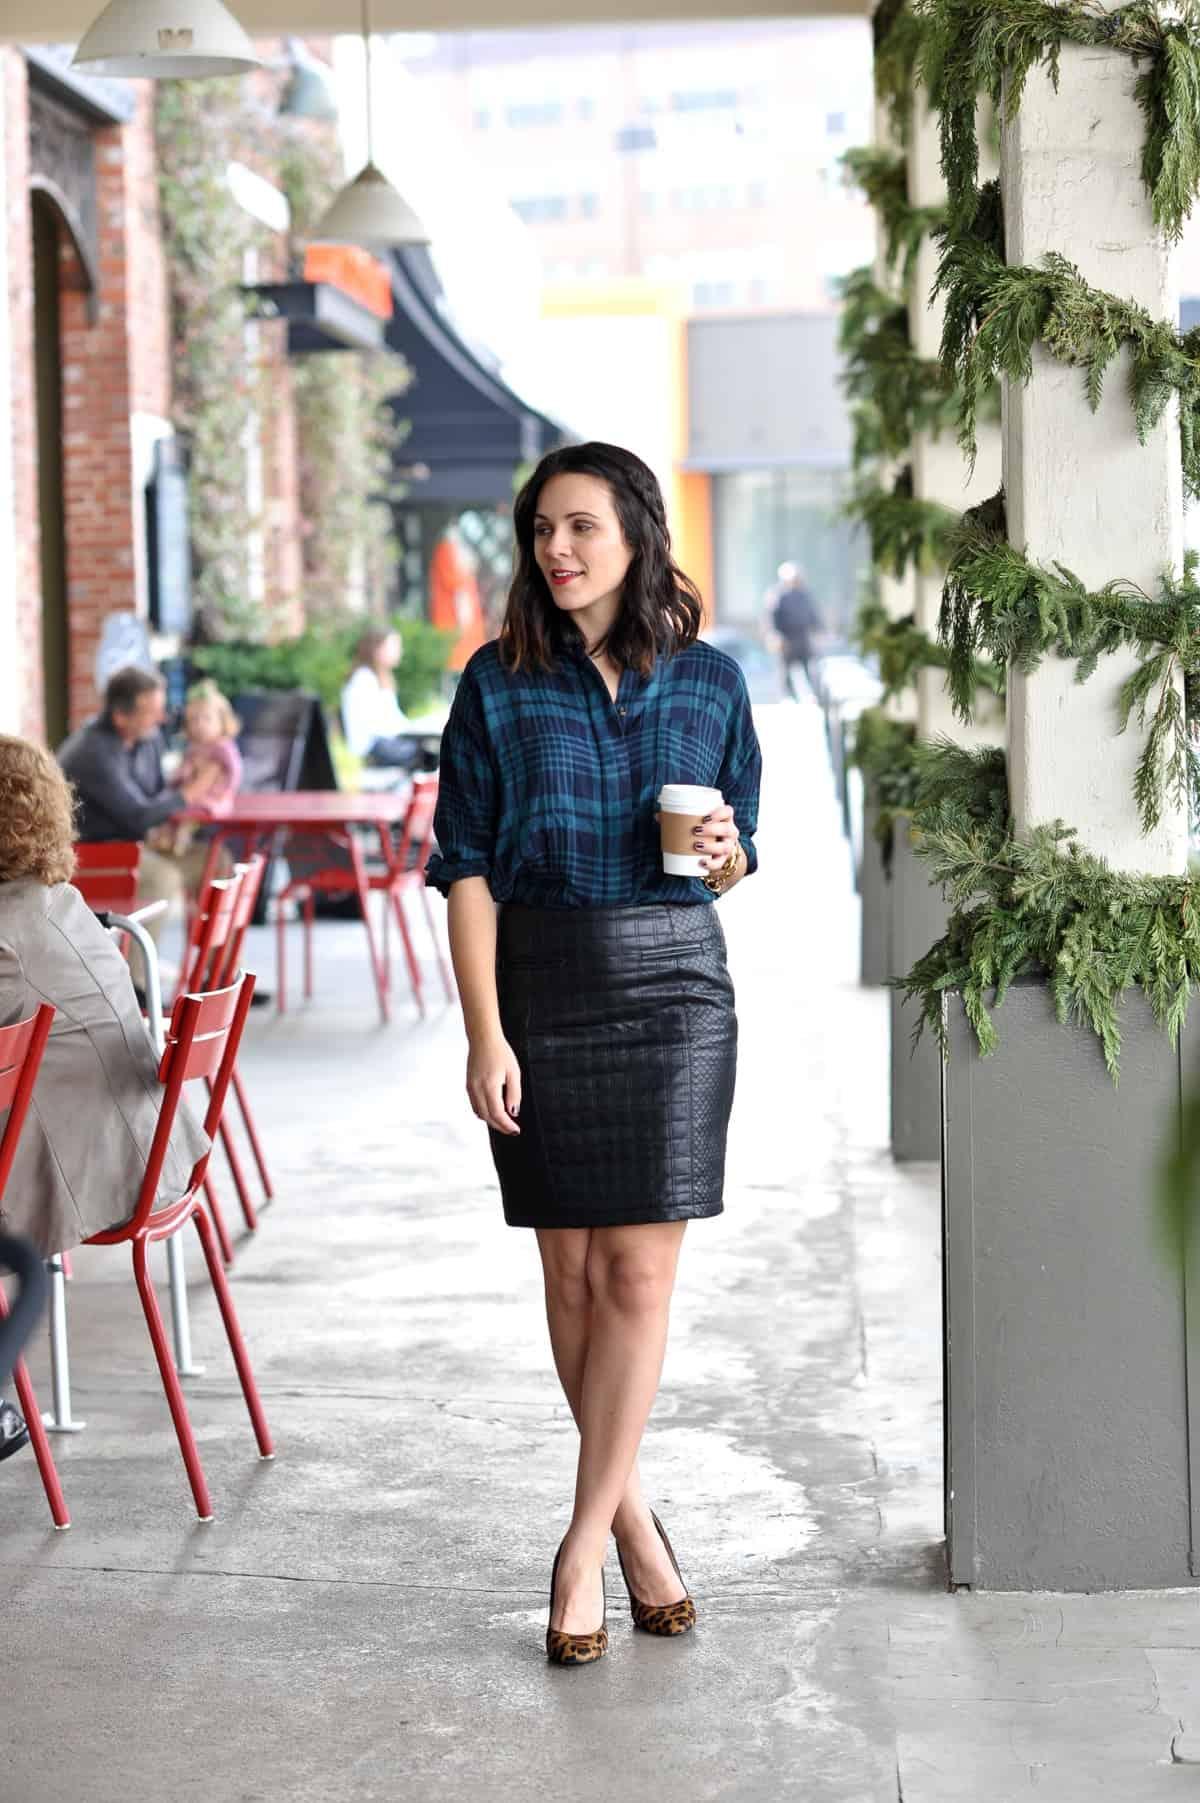 plaid shirt and leather skirt - @mystylevita